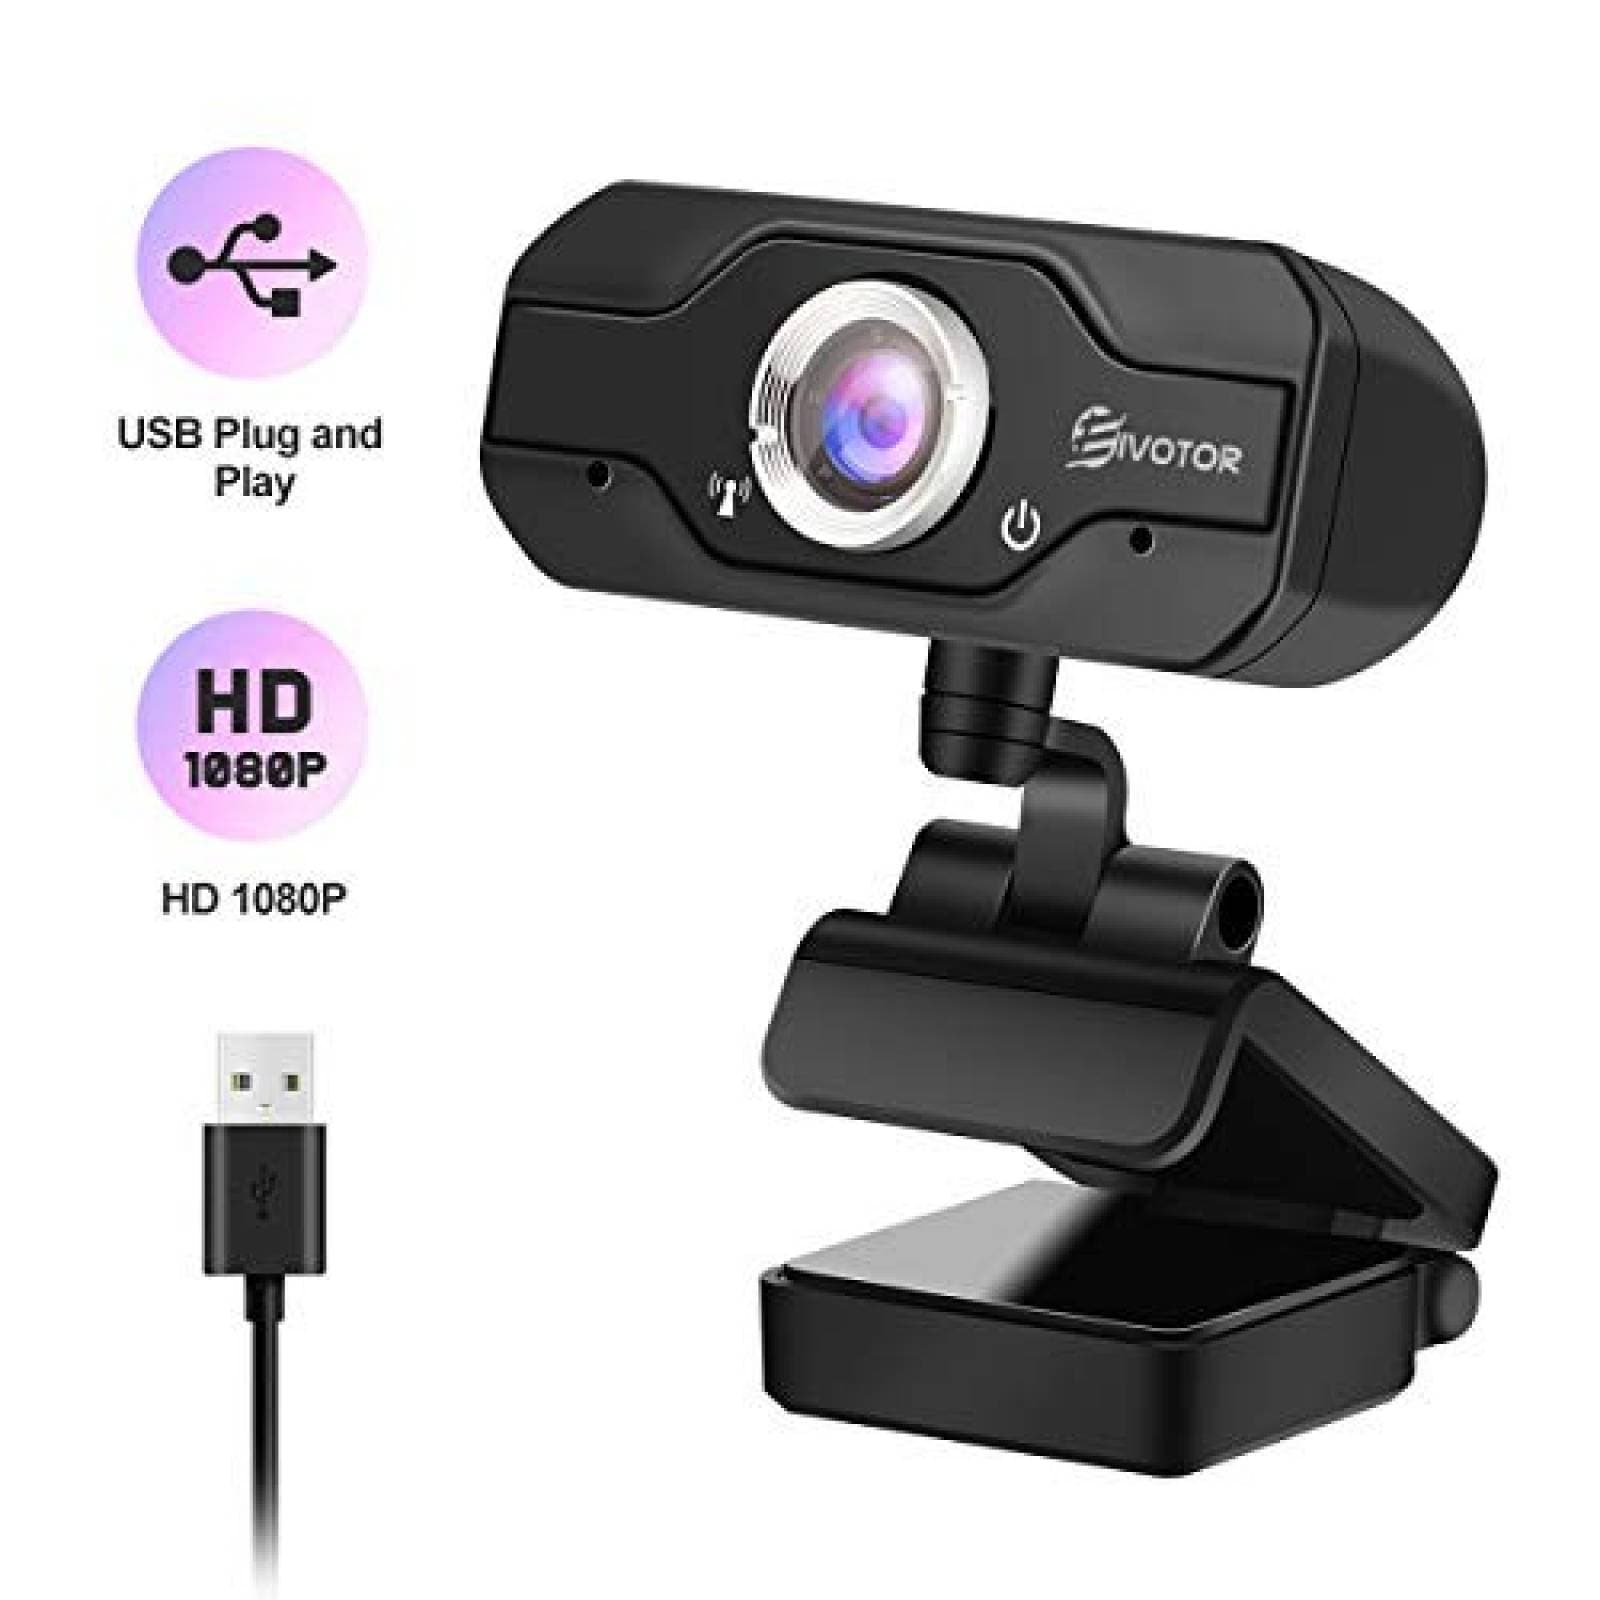 Webcam EIVOTOR HD 1080P USB c/micrófono plug and play -Negro